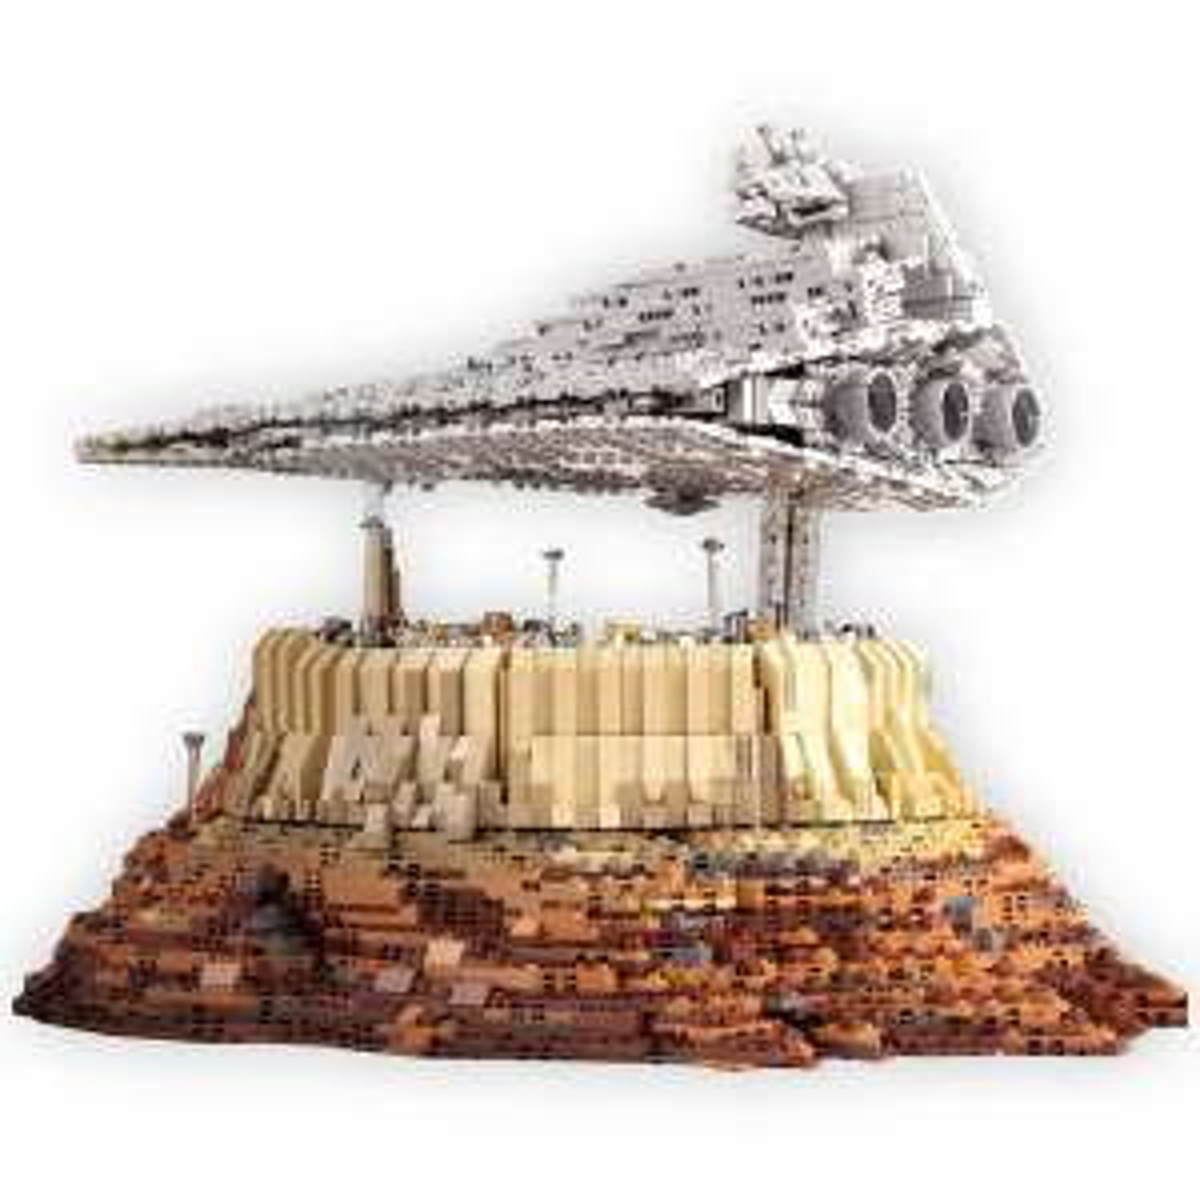 Mould King: Empire Over Jedha City - Klemmbaustein Sternenzerstörer aus Europa (5162 Teile, Zwillings-Ionenantrieb, Star Wars)